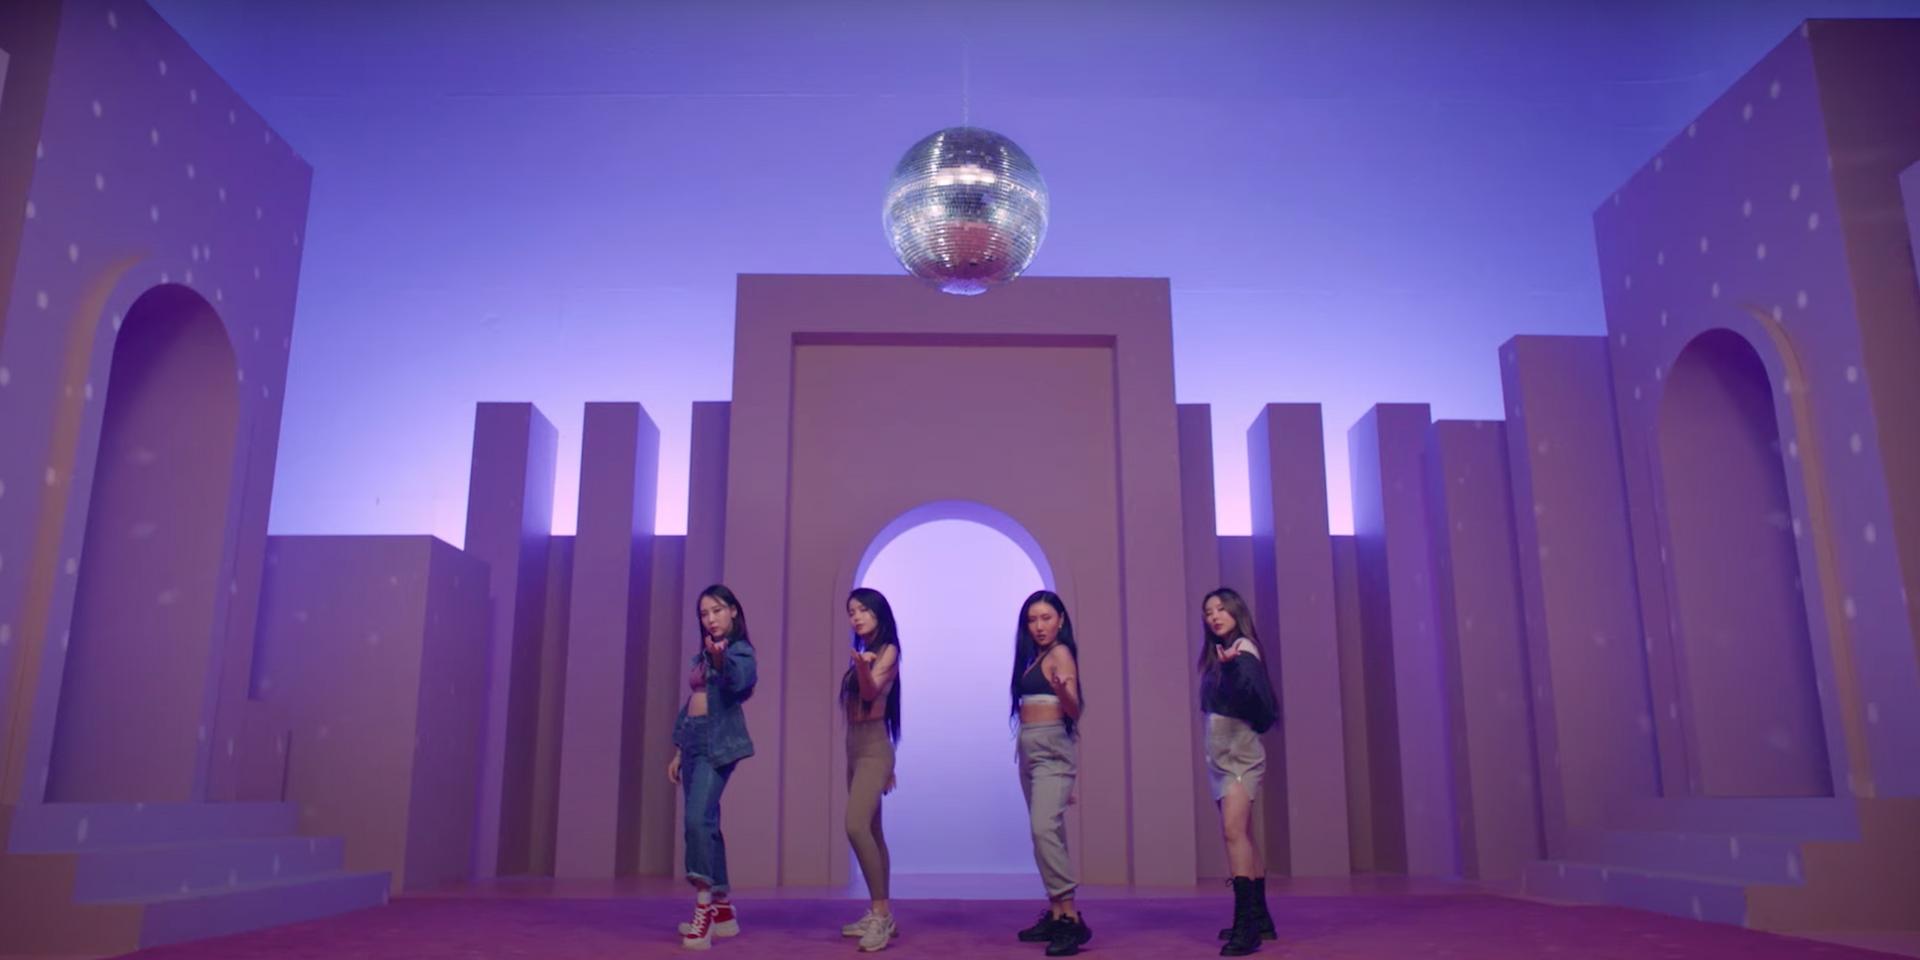 MAMAMOO drop surprise single and music video 'WANNA BE MYSELF' – watch